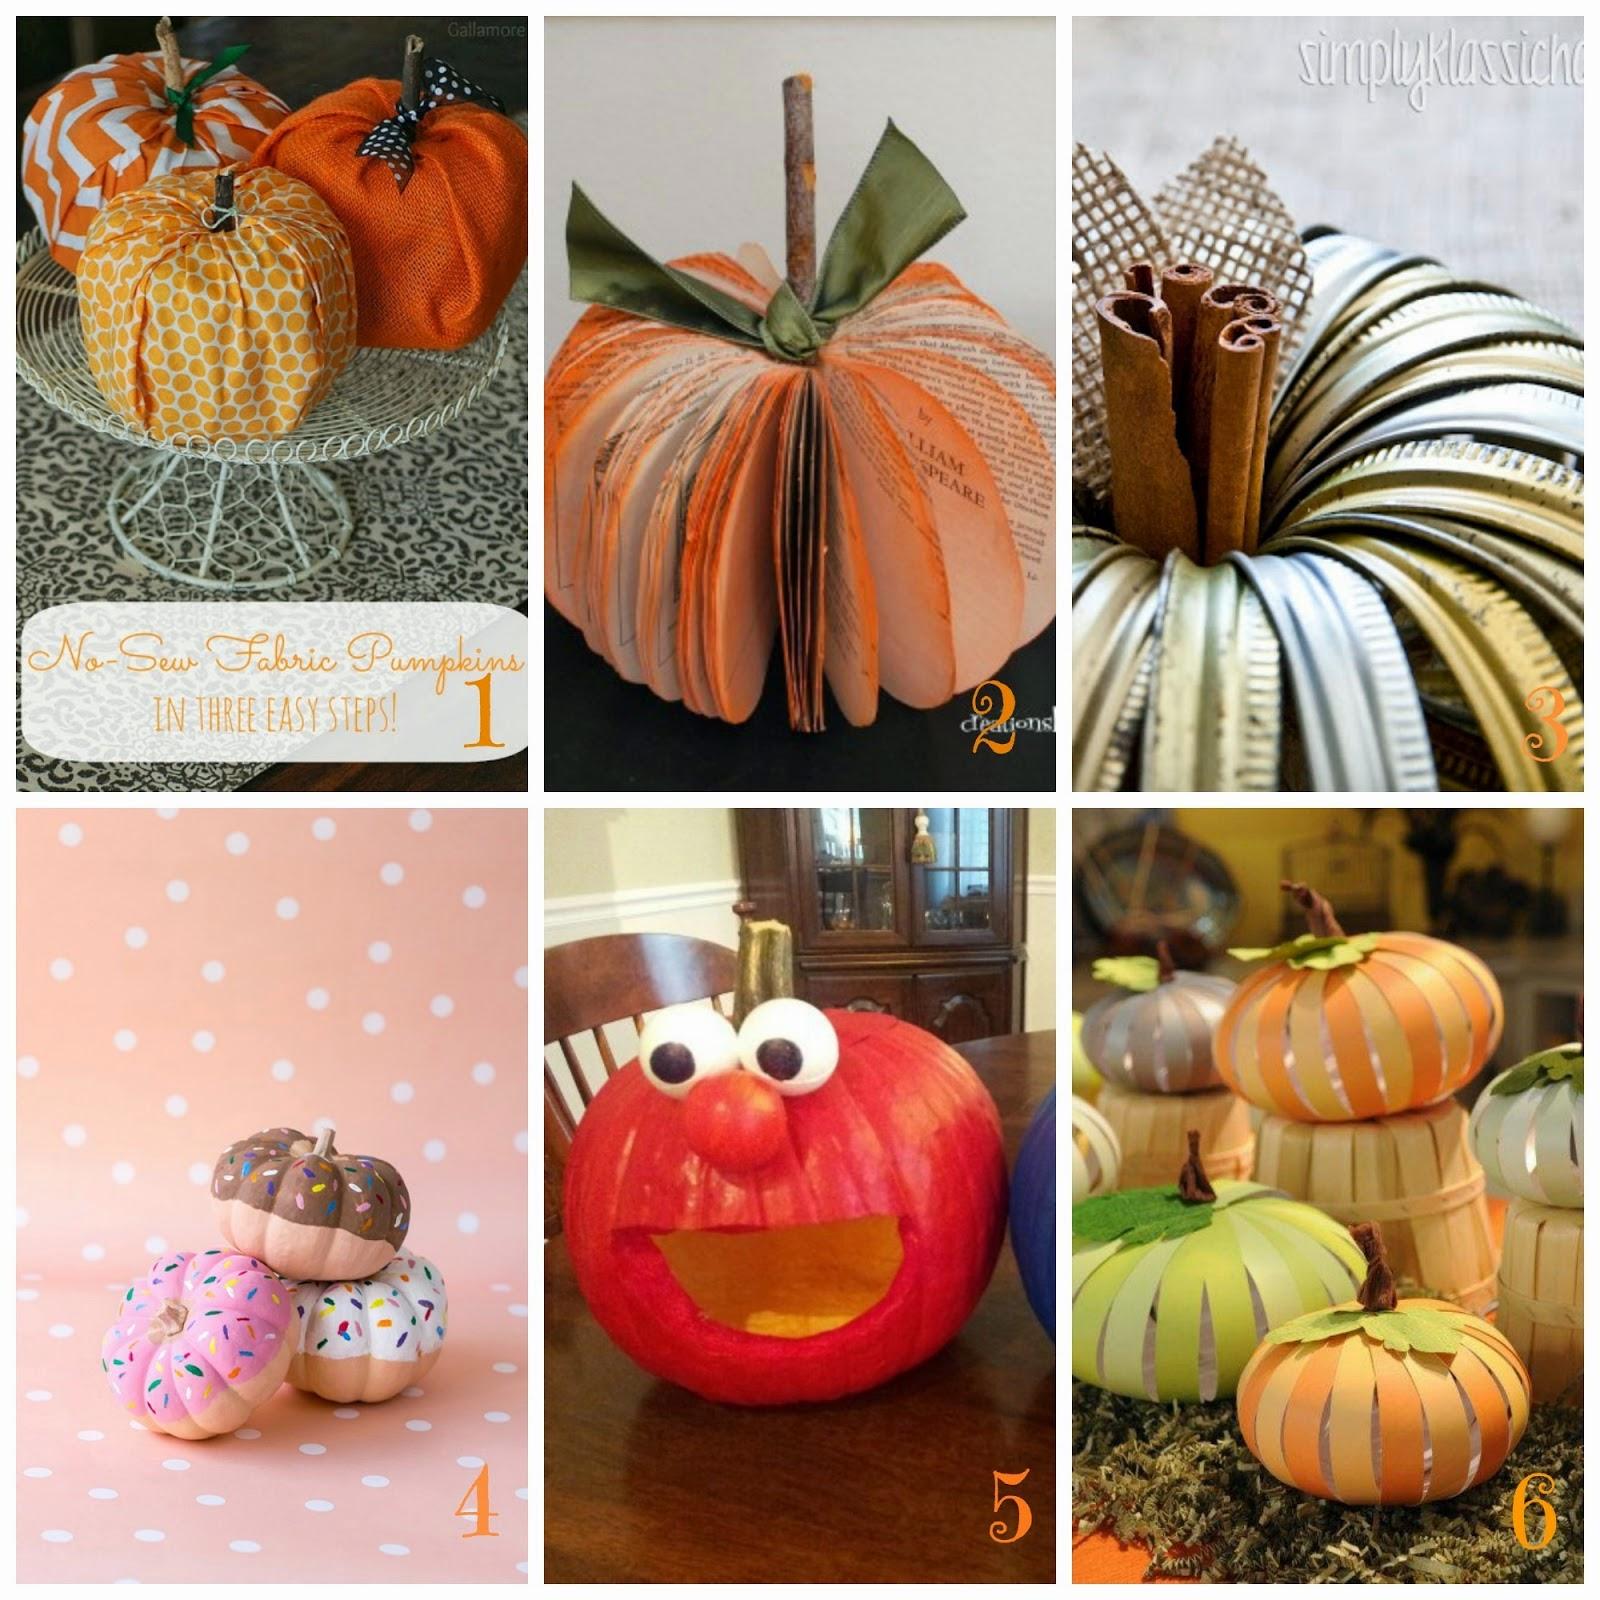 Donneinpink risparmio e fai da te halloween for Decorazioni torte halloween fai da te